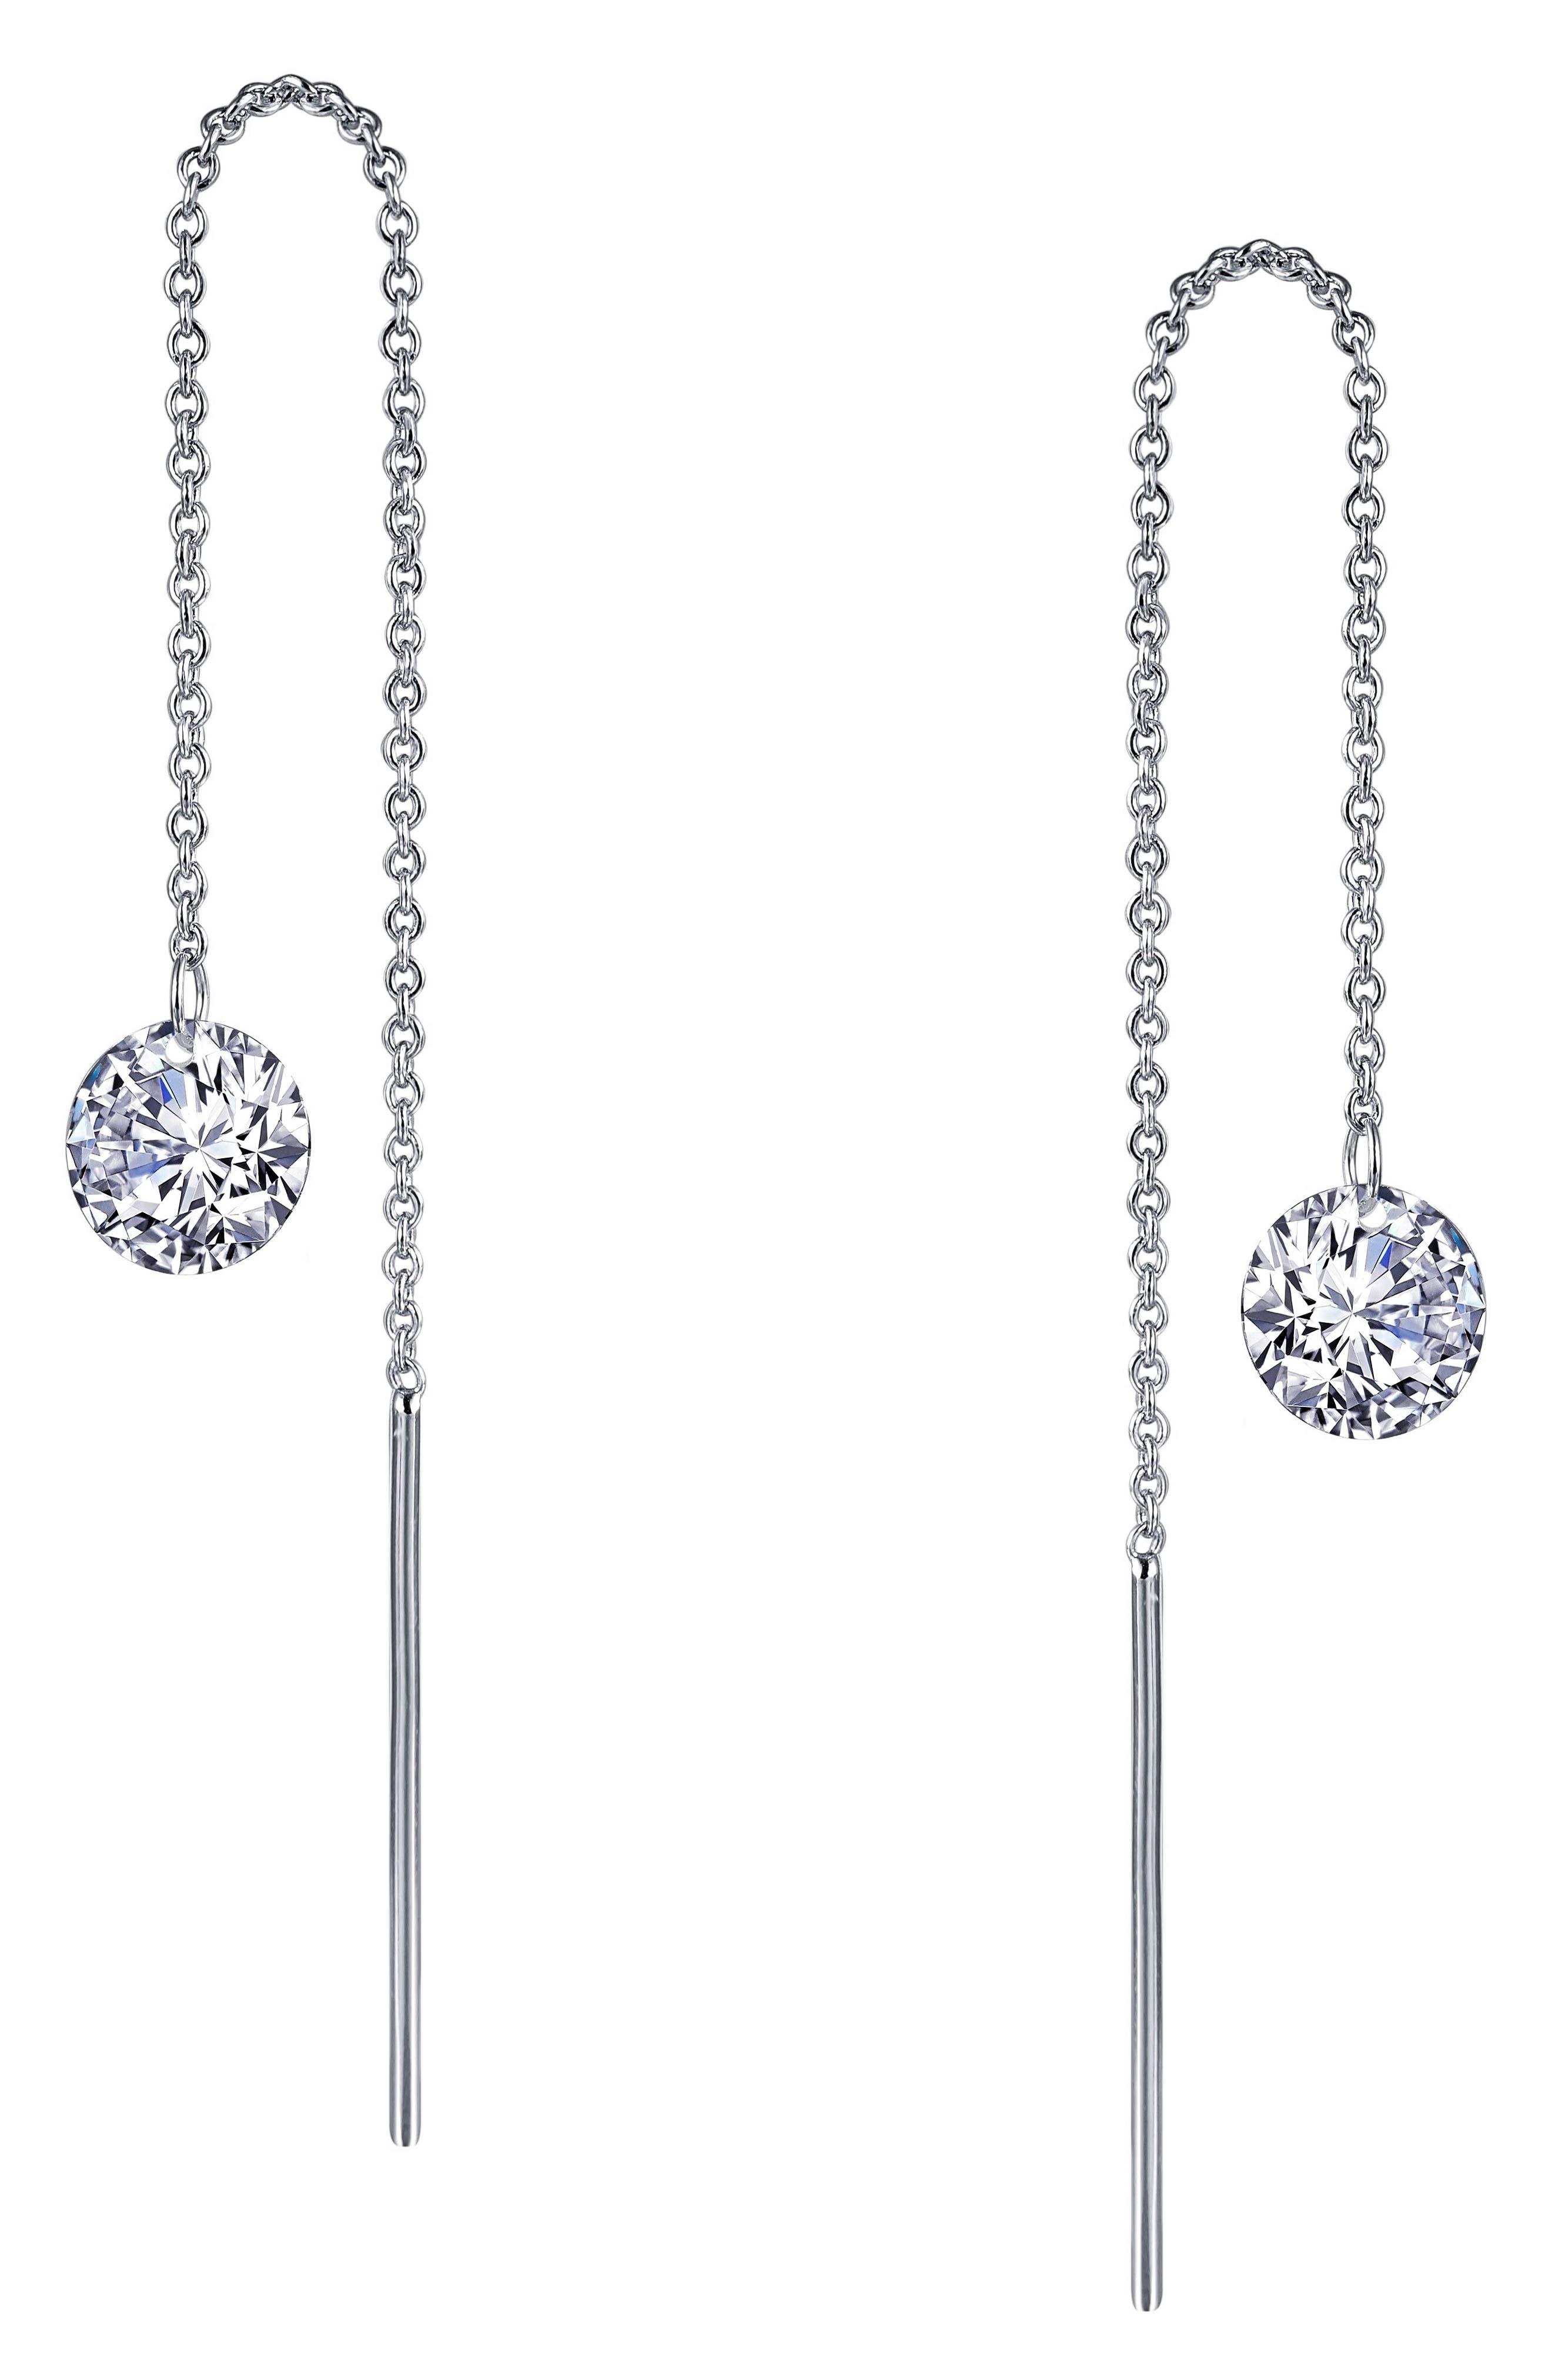 Simulated Diamond Threader Earrings,                         Main,                         color, SILVER